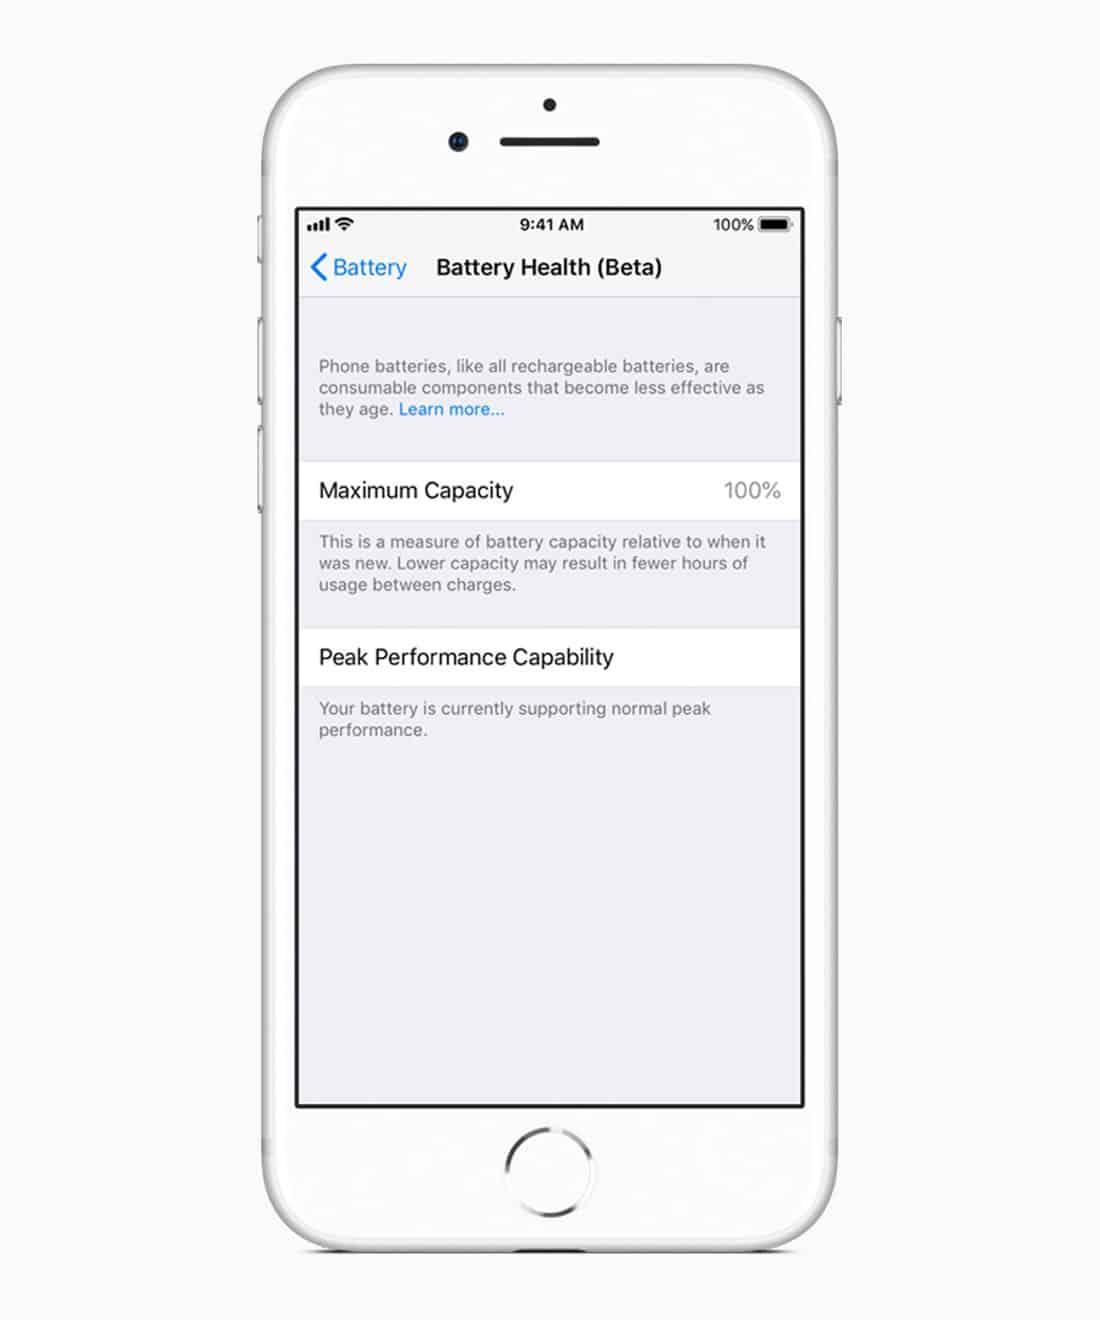 Apple iOS 11.3 battery health screen 03292018